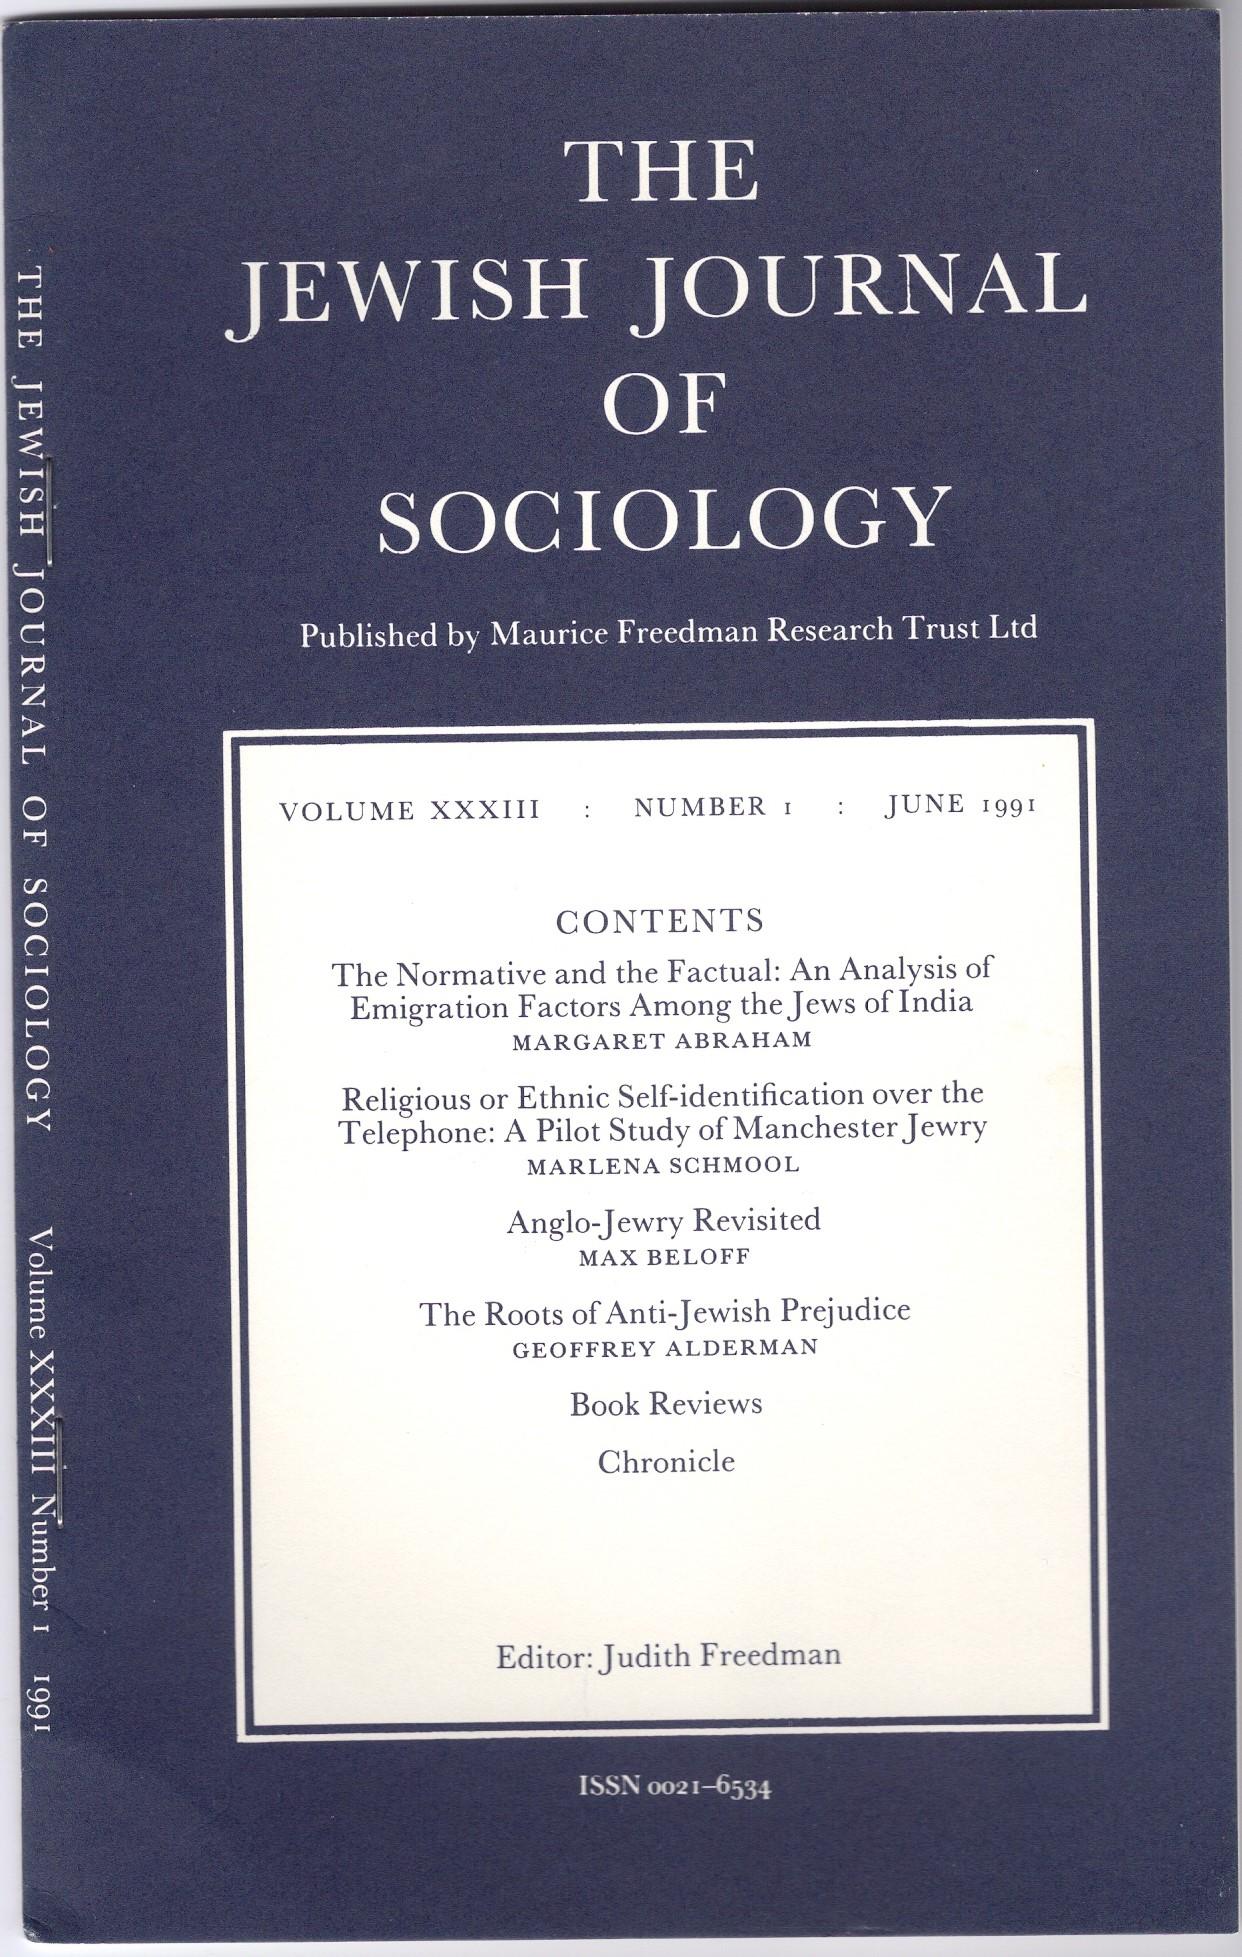 Jewish Journal of Sociology 1991.jpg